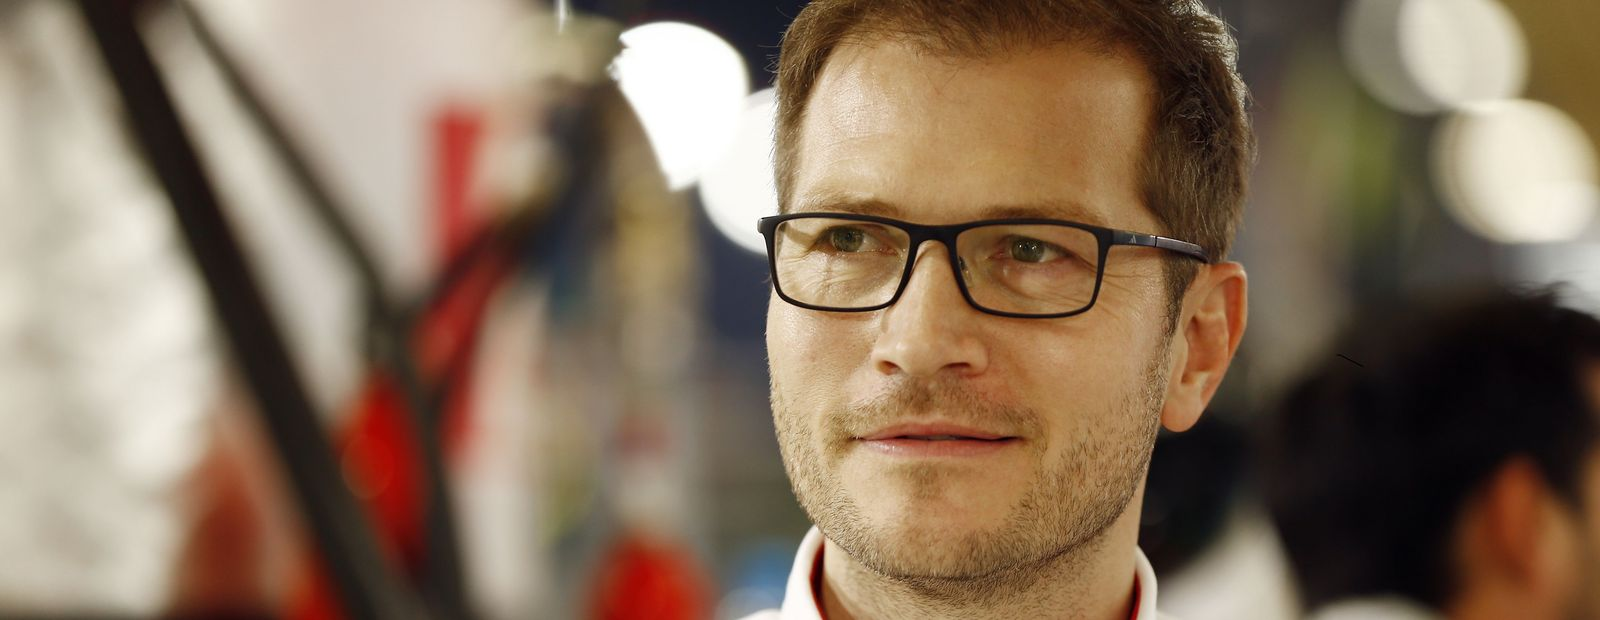 Andreas Seidl racingline.hu, racingline, racinglinehu